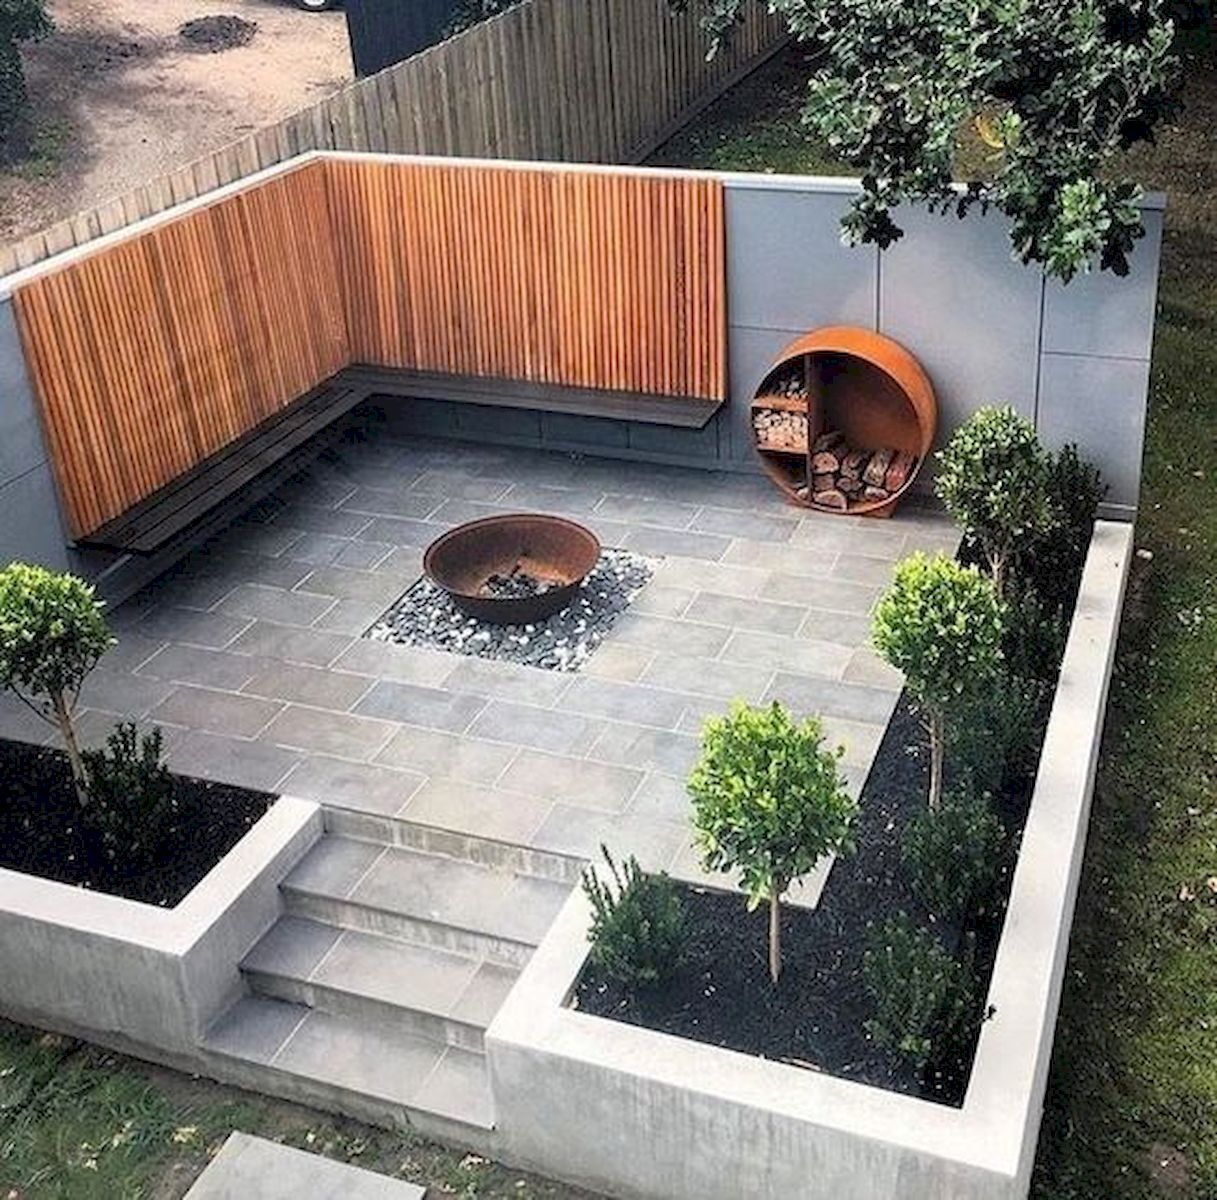 40 Fabulous Modern Garden Designs Ideas For Front Yard And Backyard 14 Garden Architecture Courtyard Gardens Design Outdoor Patio Designs